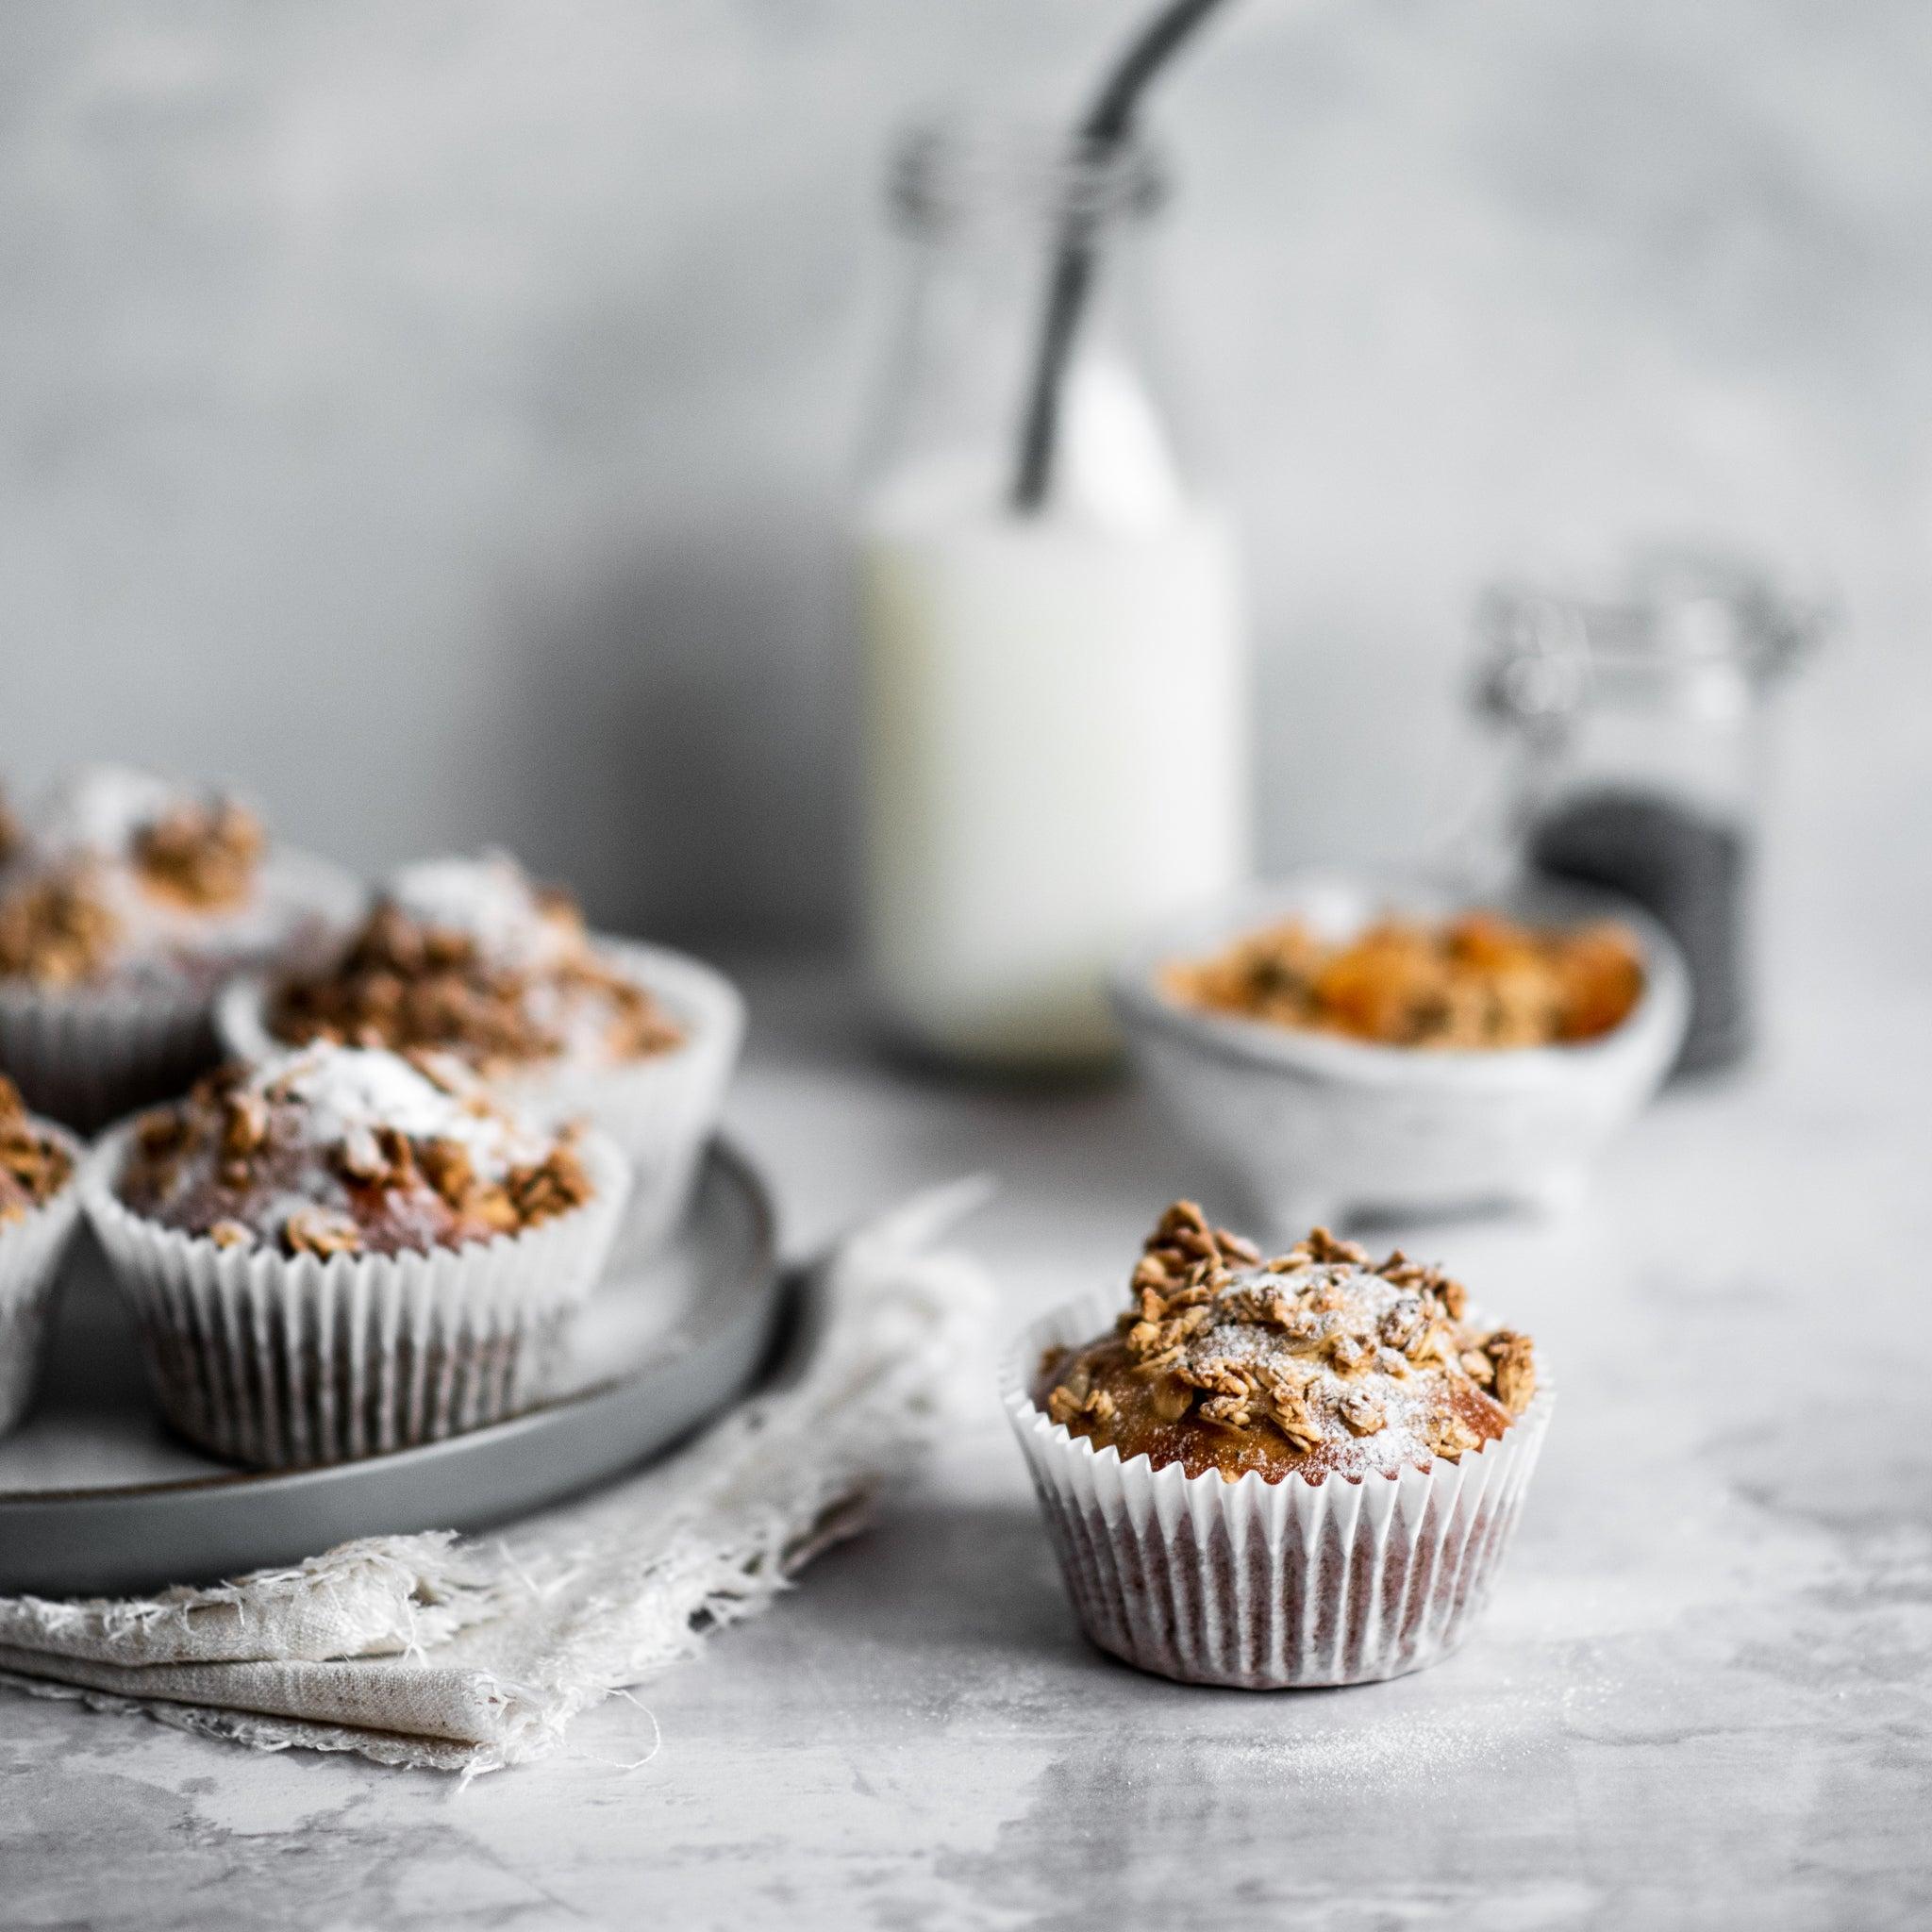 Granola-Breakfast-Muffins-SQUARE-1.jpg